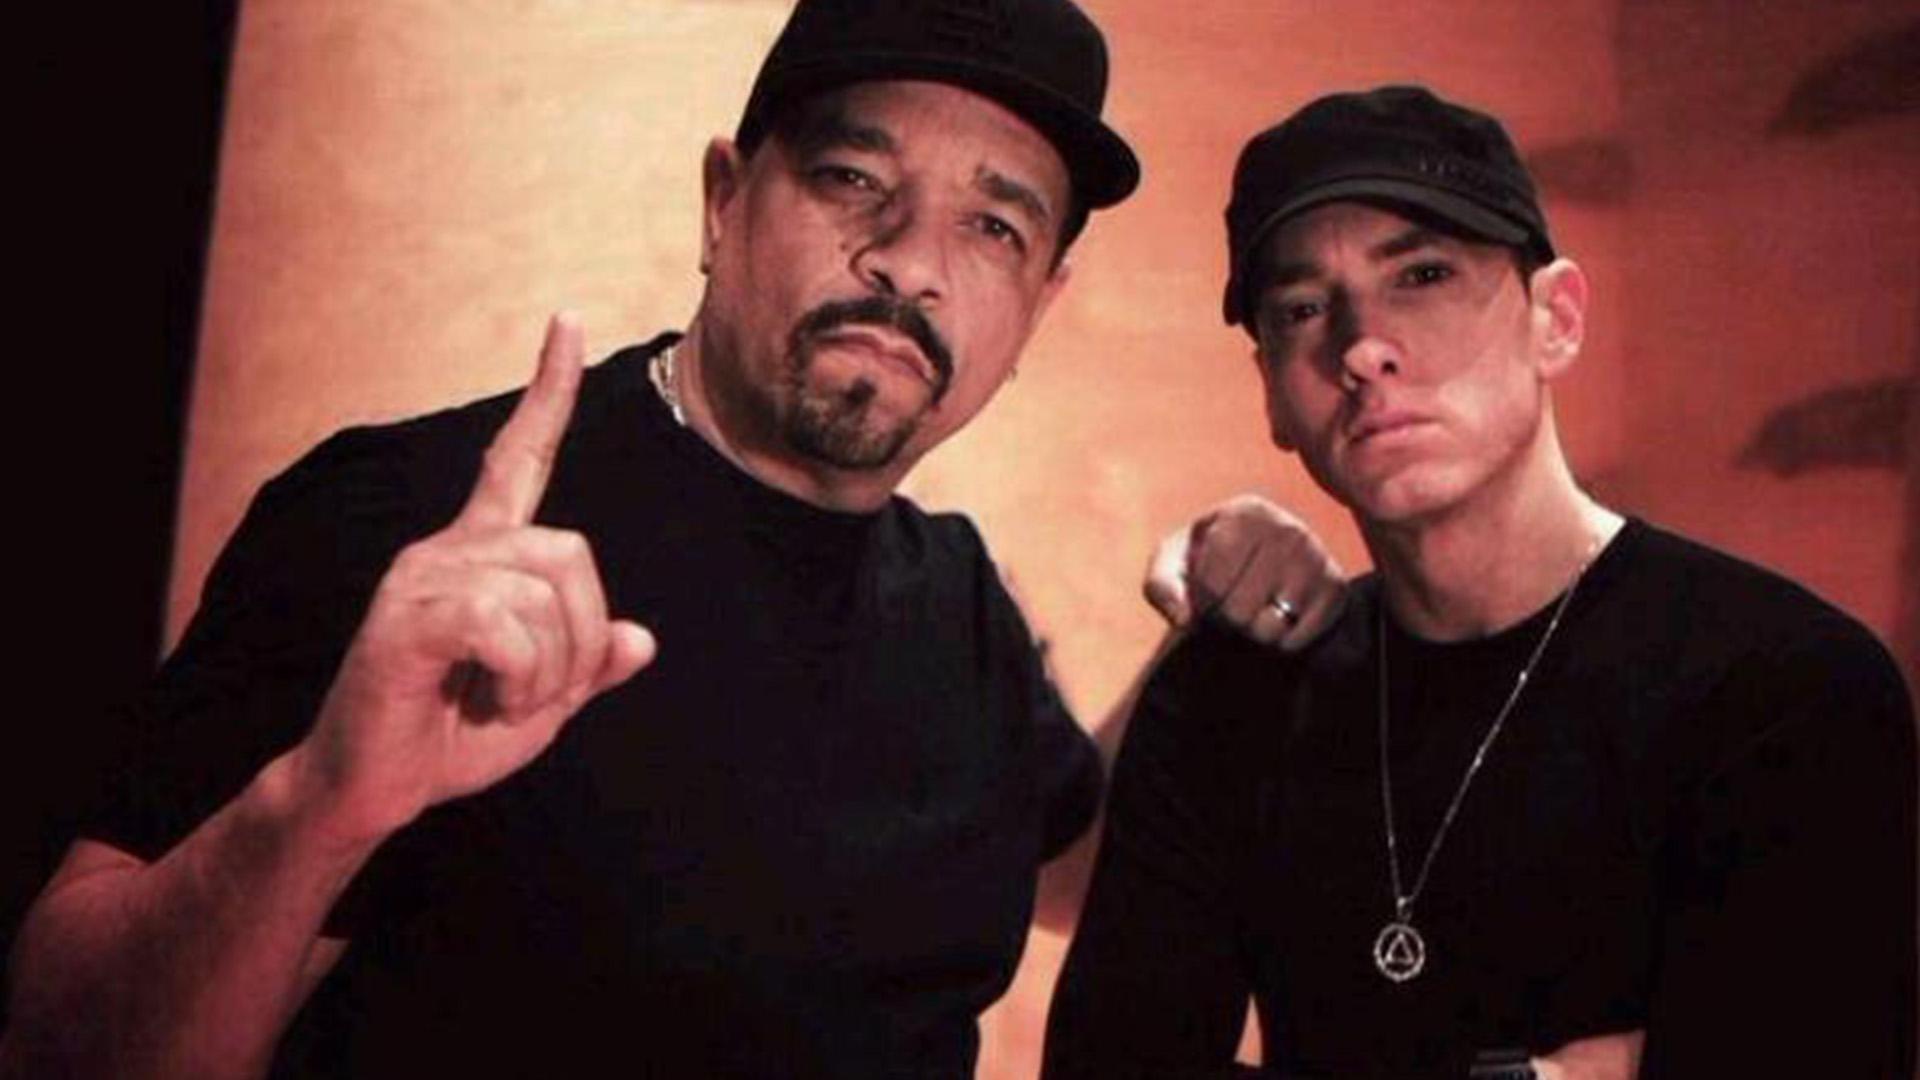 Ice-T: White kids Booed Eminem on Stage